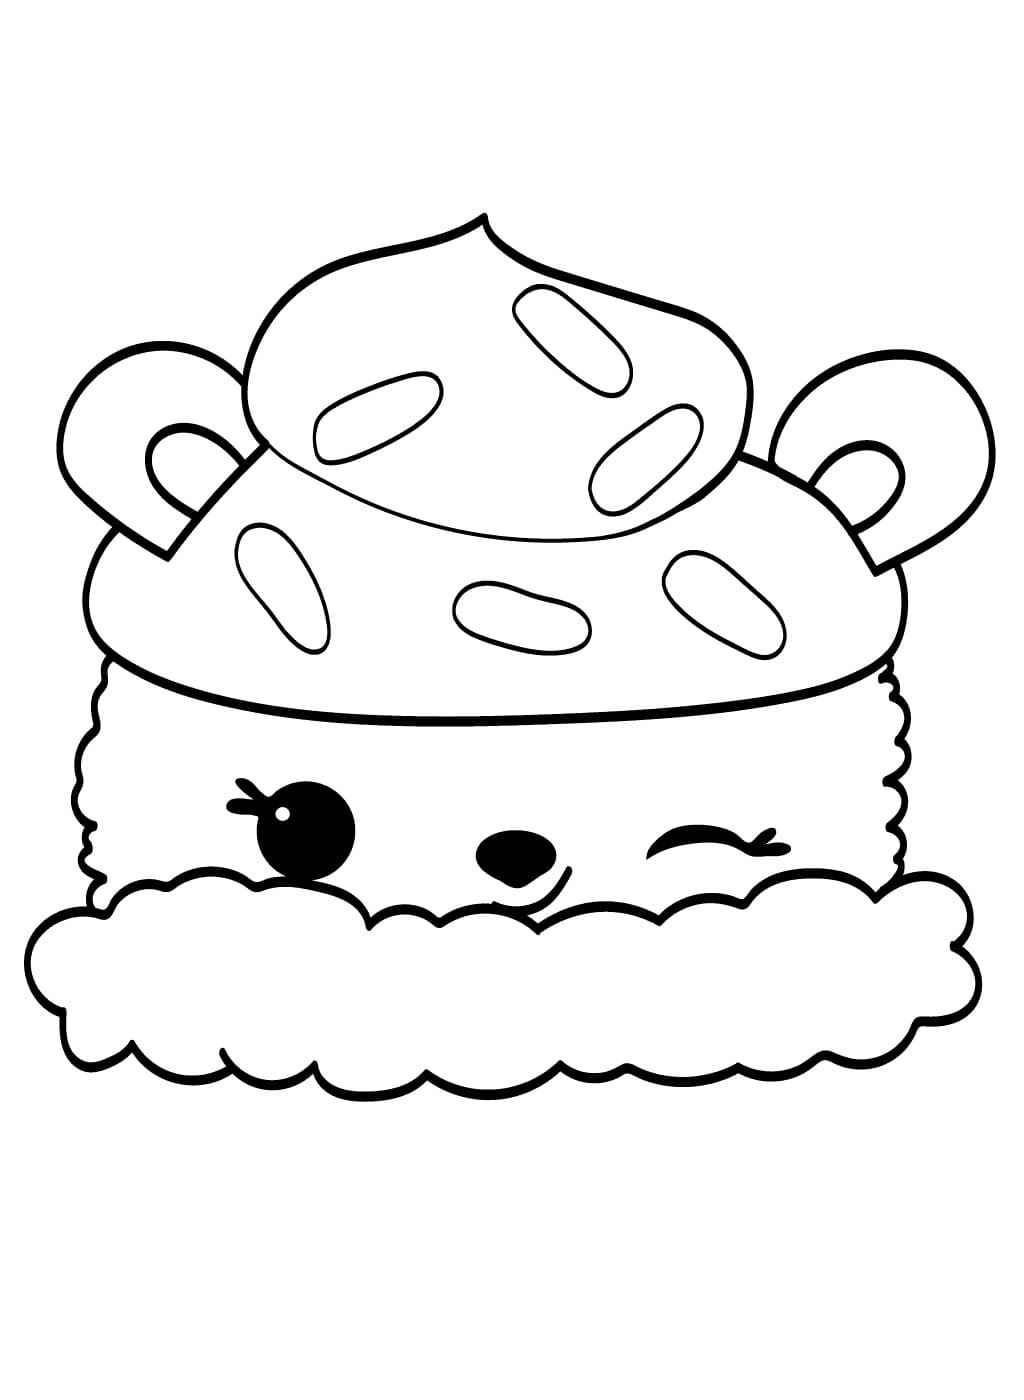 Dibujos De Kawaii Para Colorear Imprimir Caracteres Inusuales Dibujos Kawaii Dibujos De Animales Sencillos Dibujos